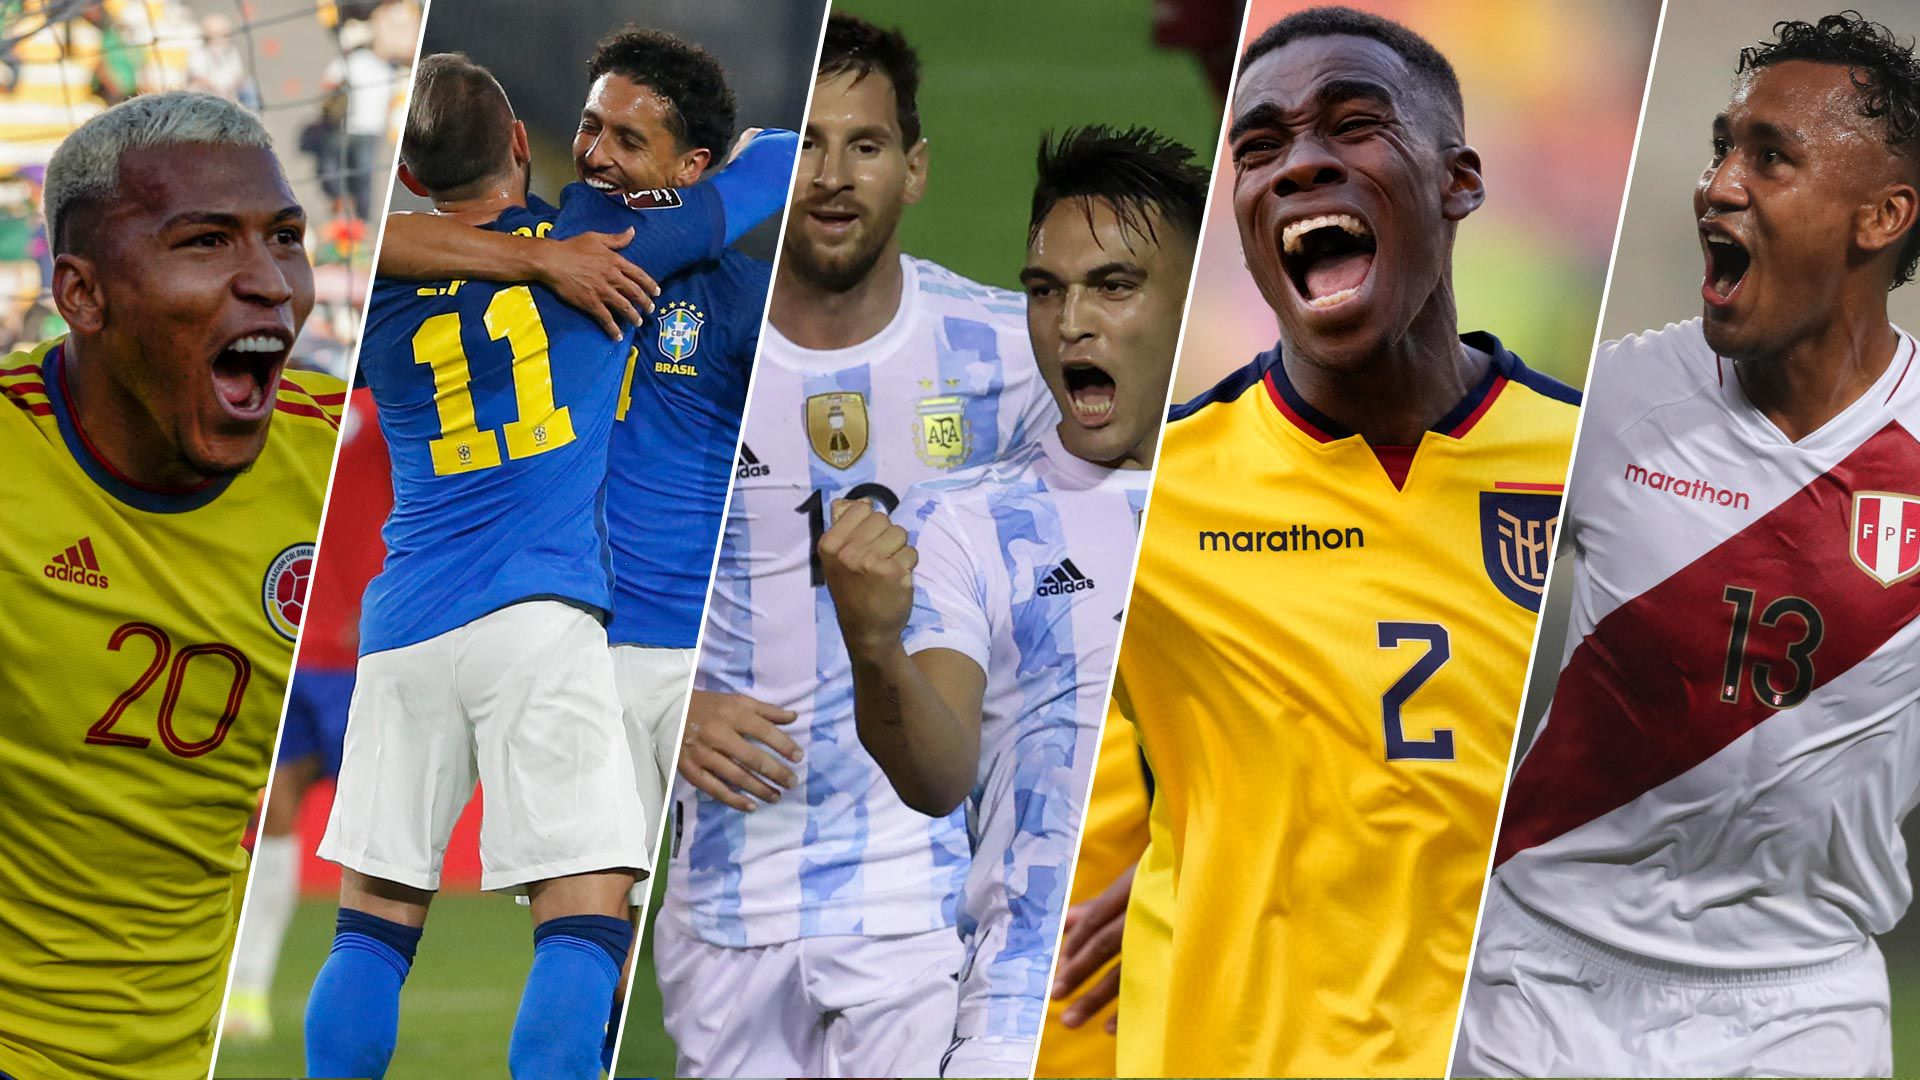 Eliminatorias Qatar 2022 / portada Colombia, brasil, argentina, ecuador, peru 1920